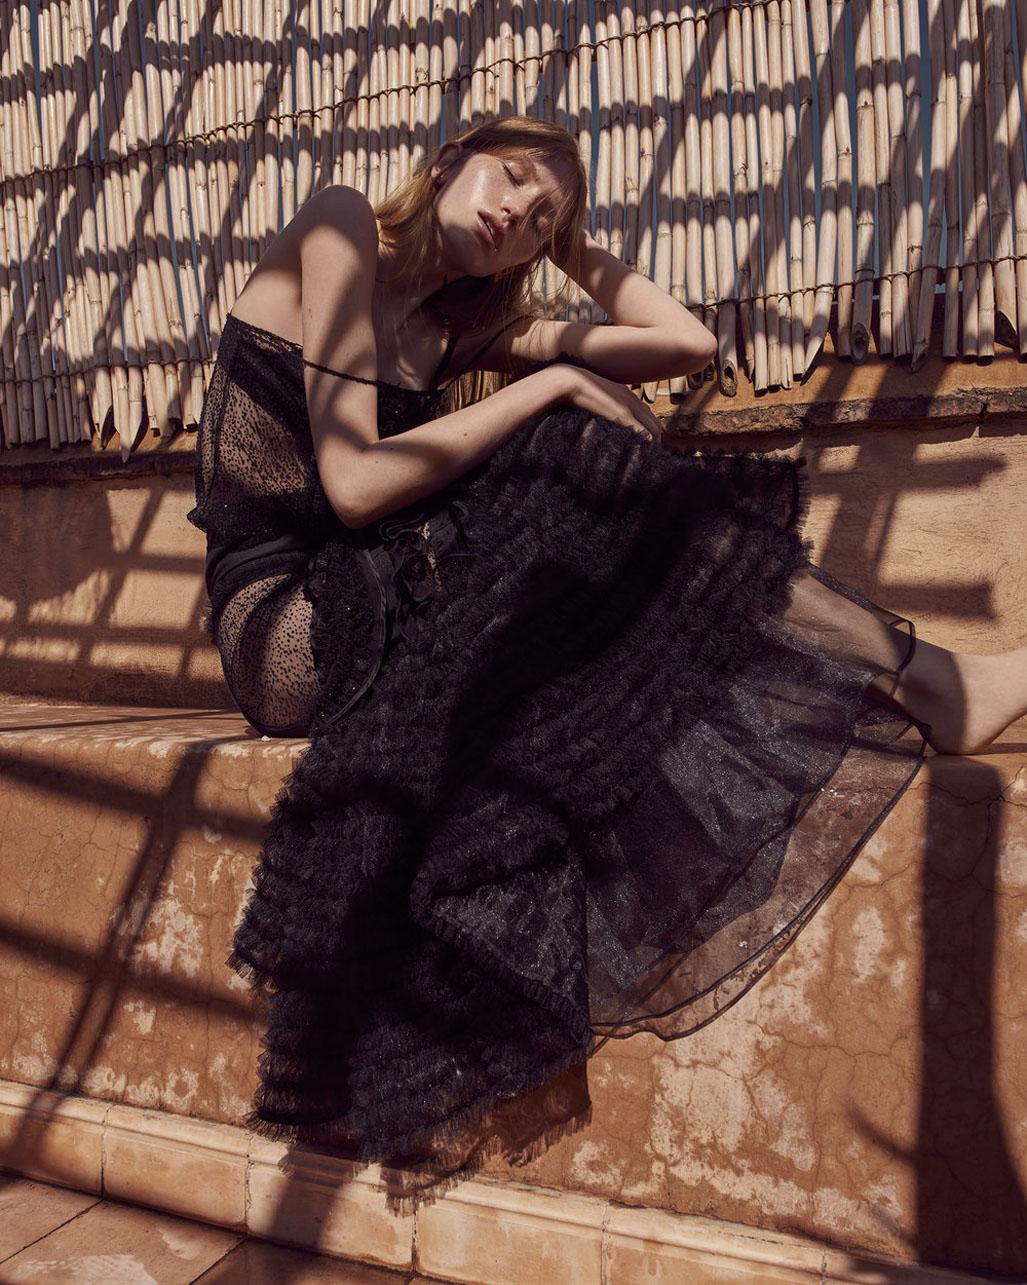 Linda Novotna by Andreas Ortner - Harpers Bazaar Czech april 2018